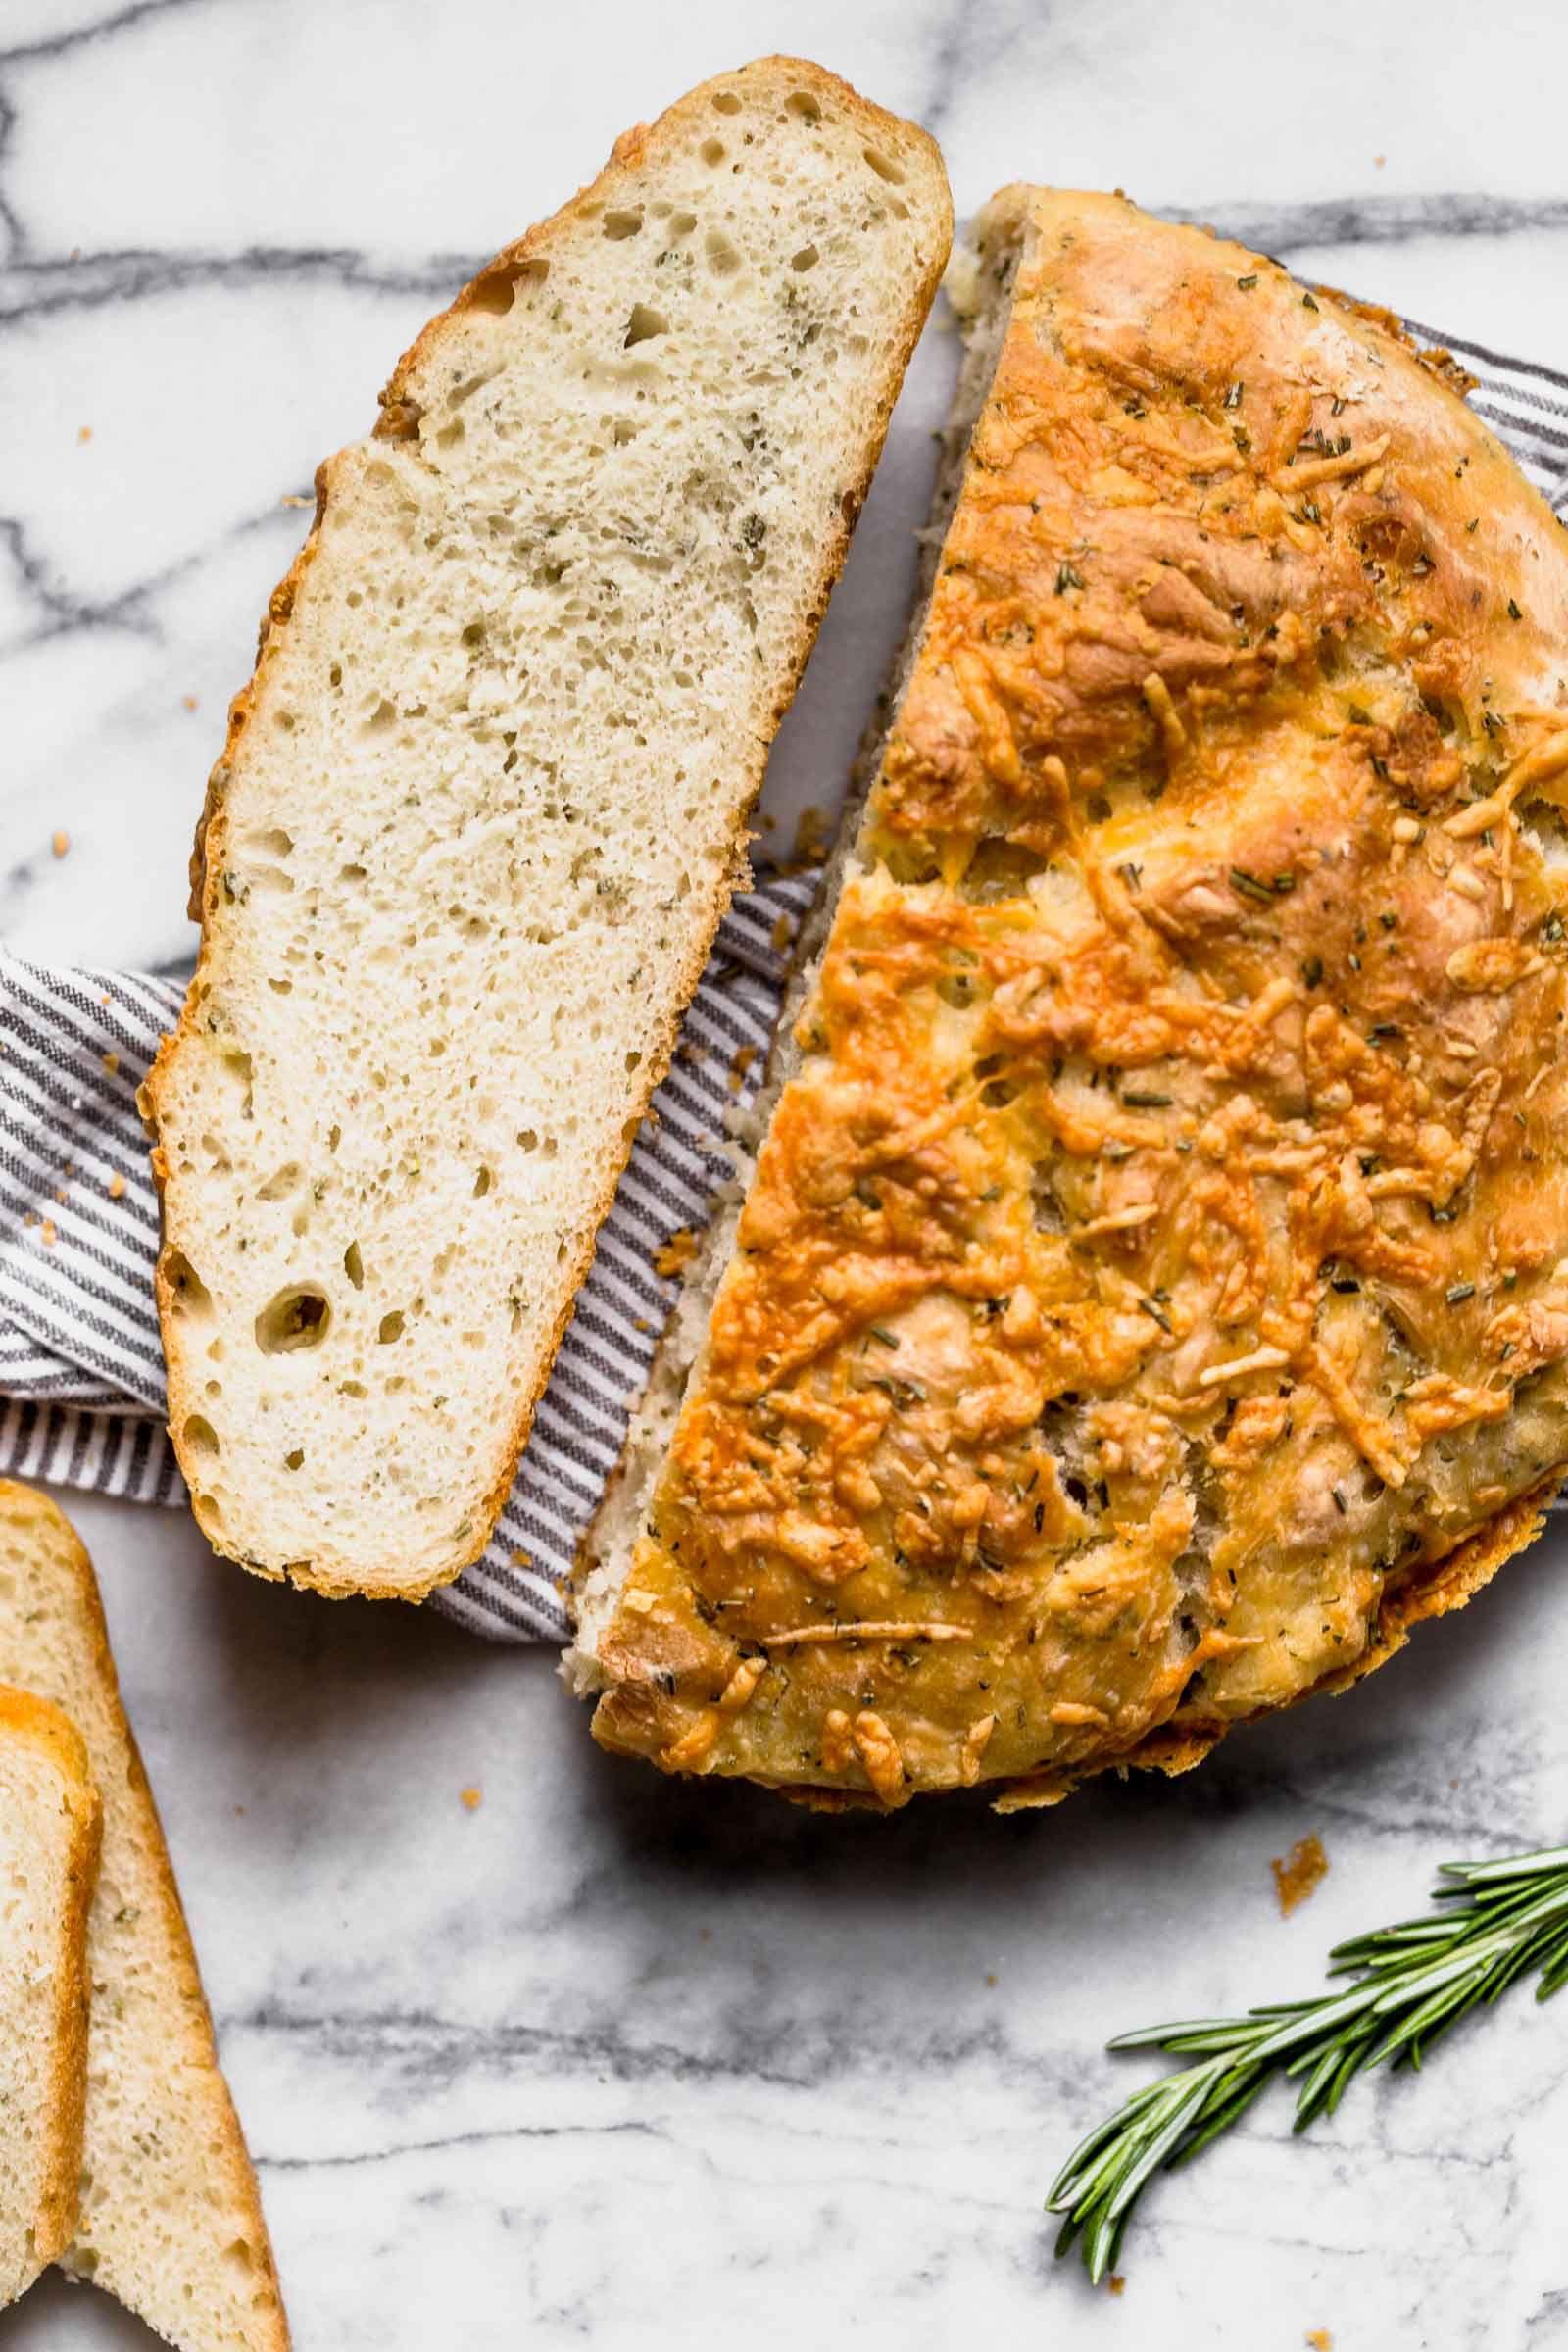 Super easy homemade bread recipe, no kneading involved ...